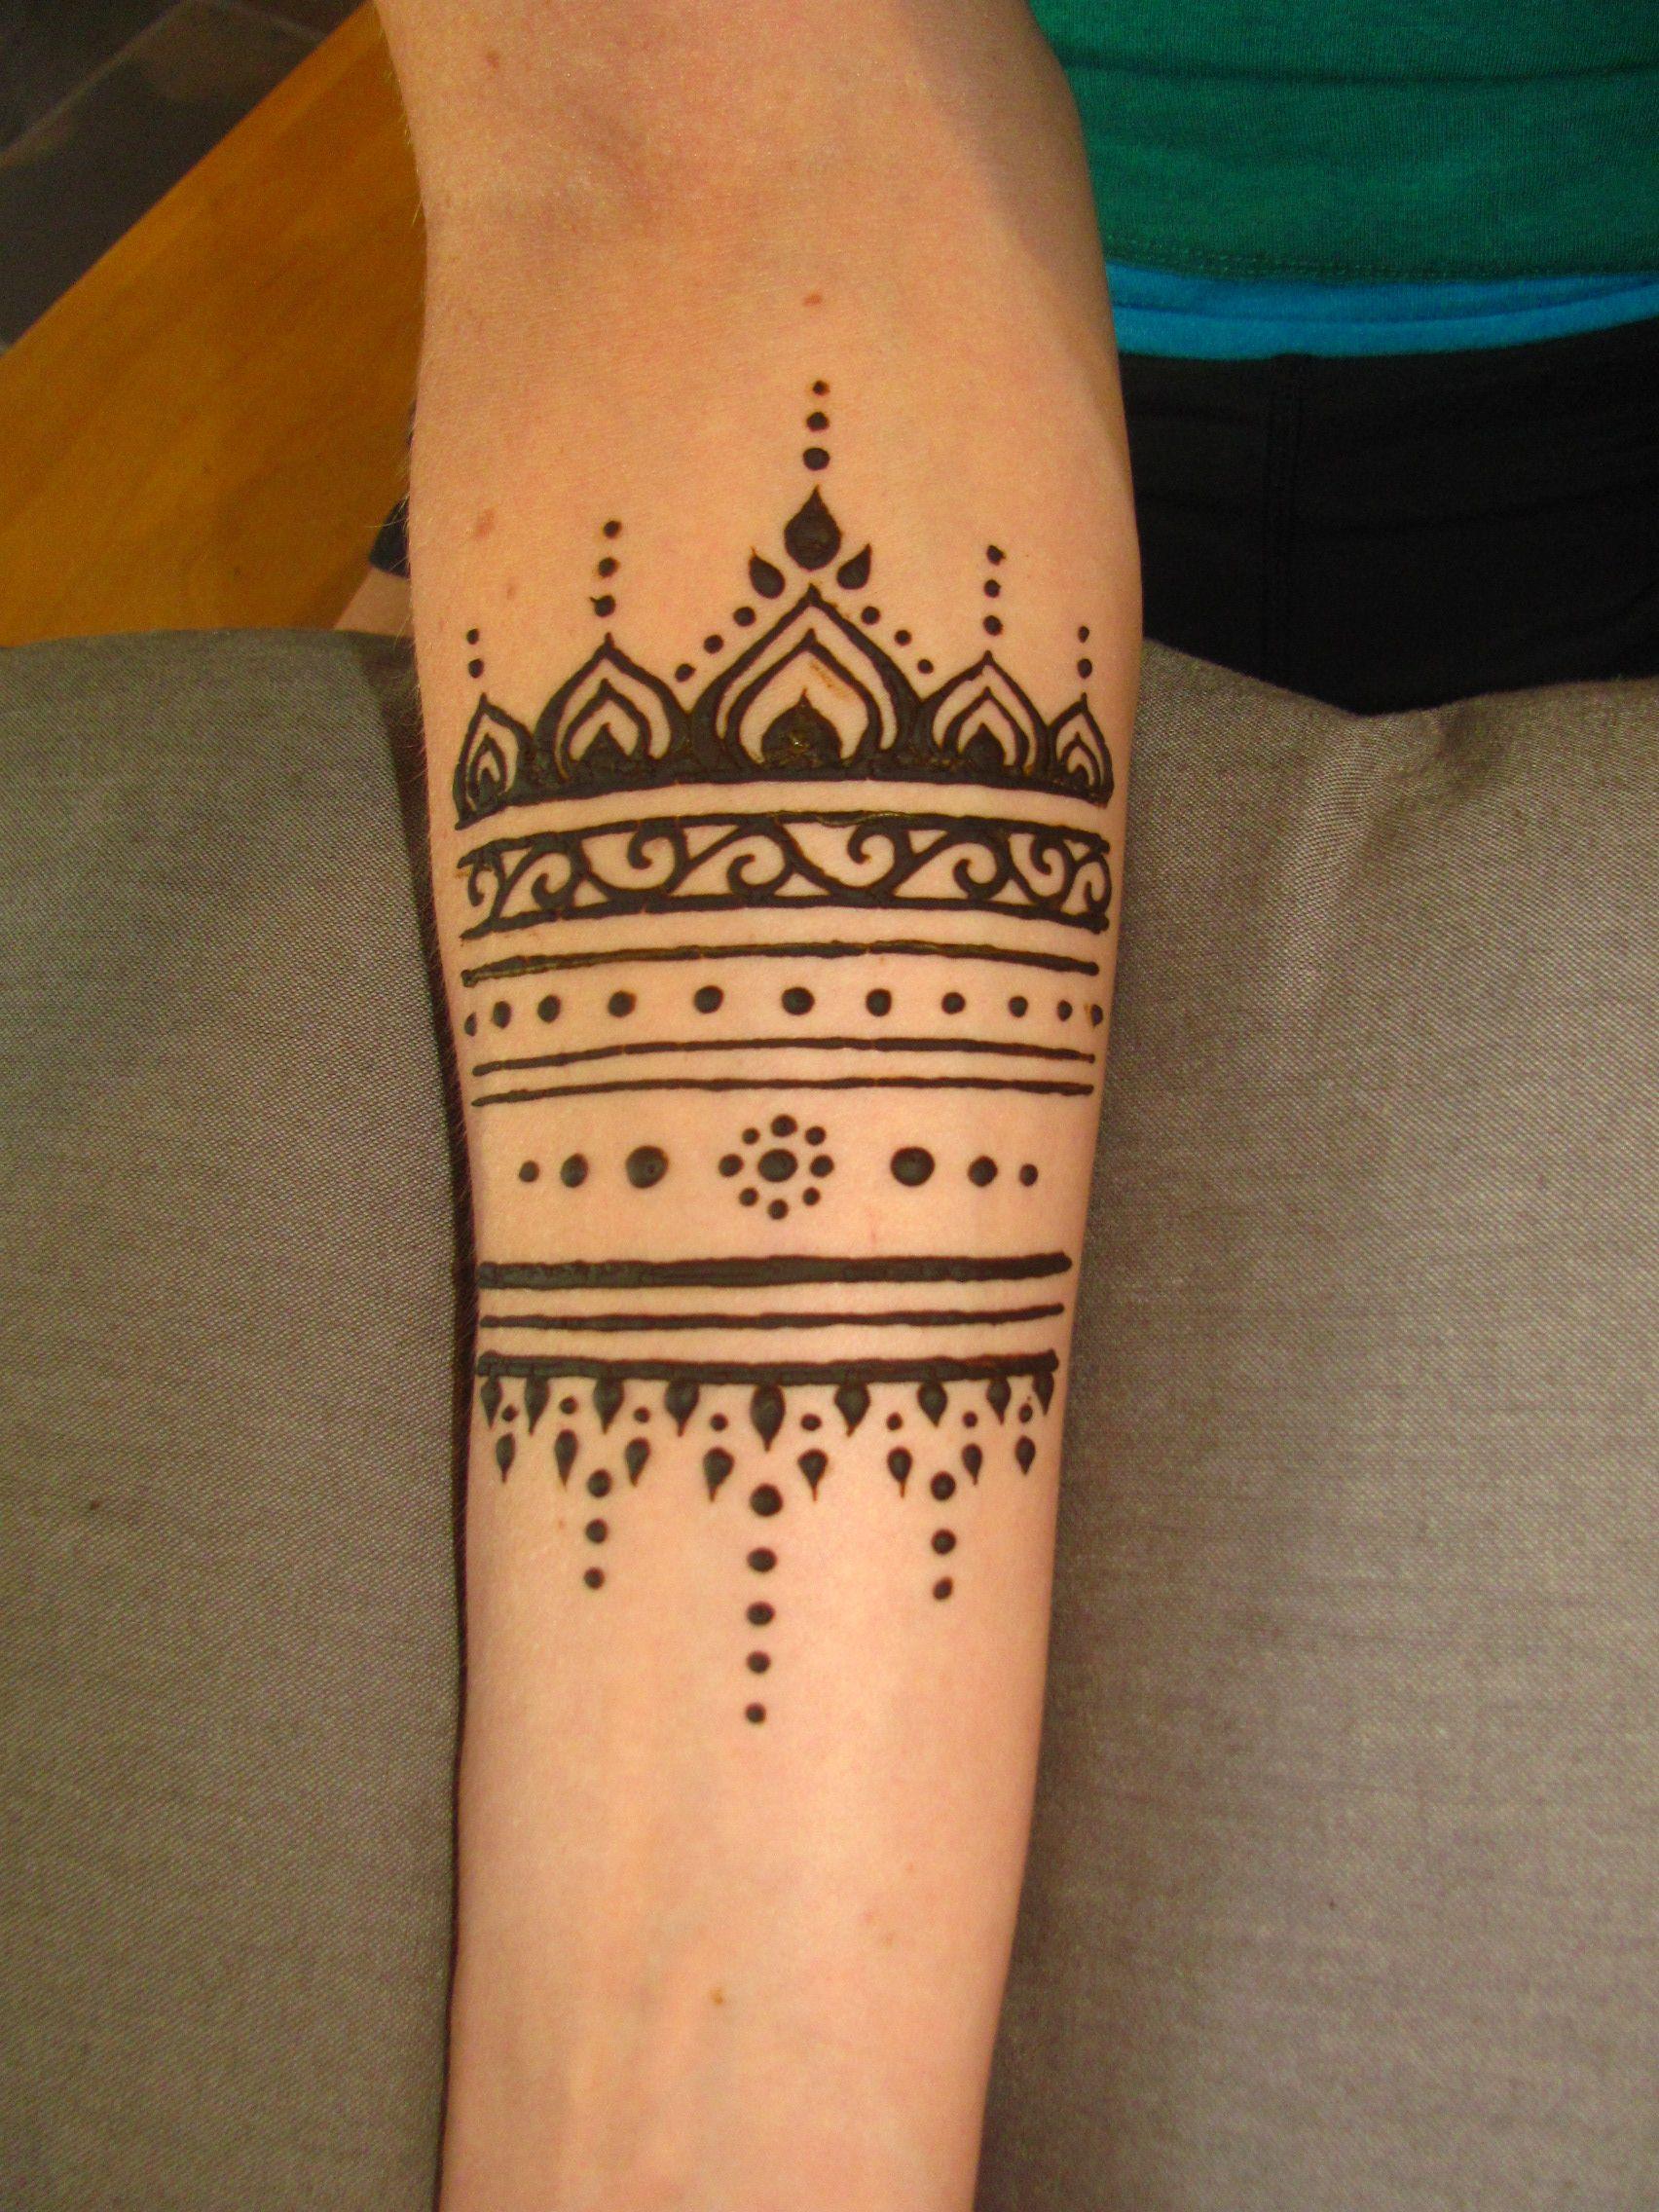 Smple Traditional Henna Tattoo Designs: Henna! Www.hierishetfeest.com